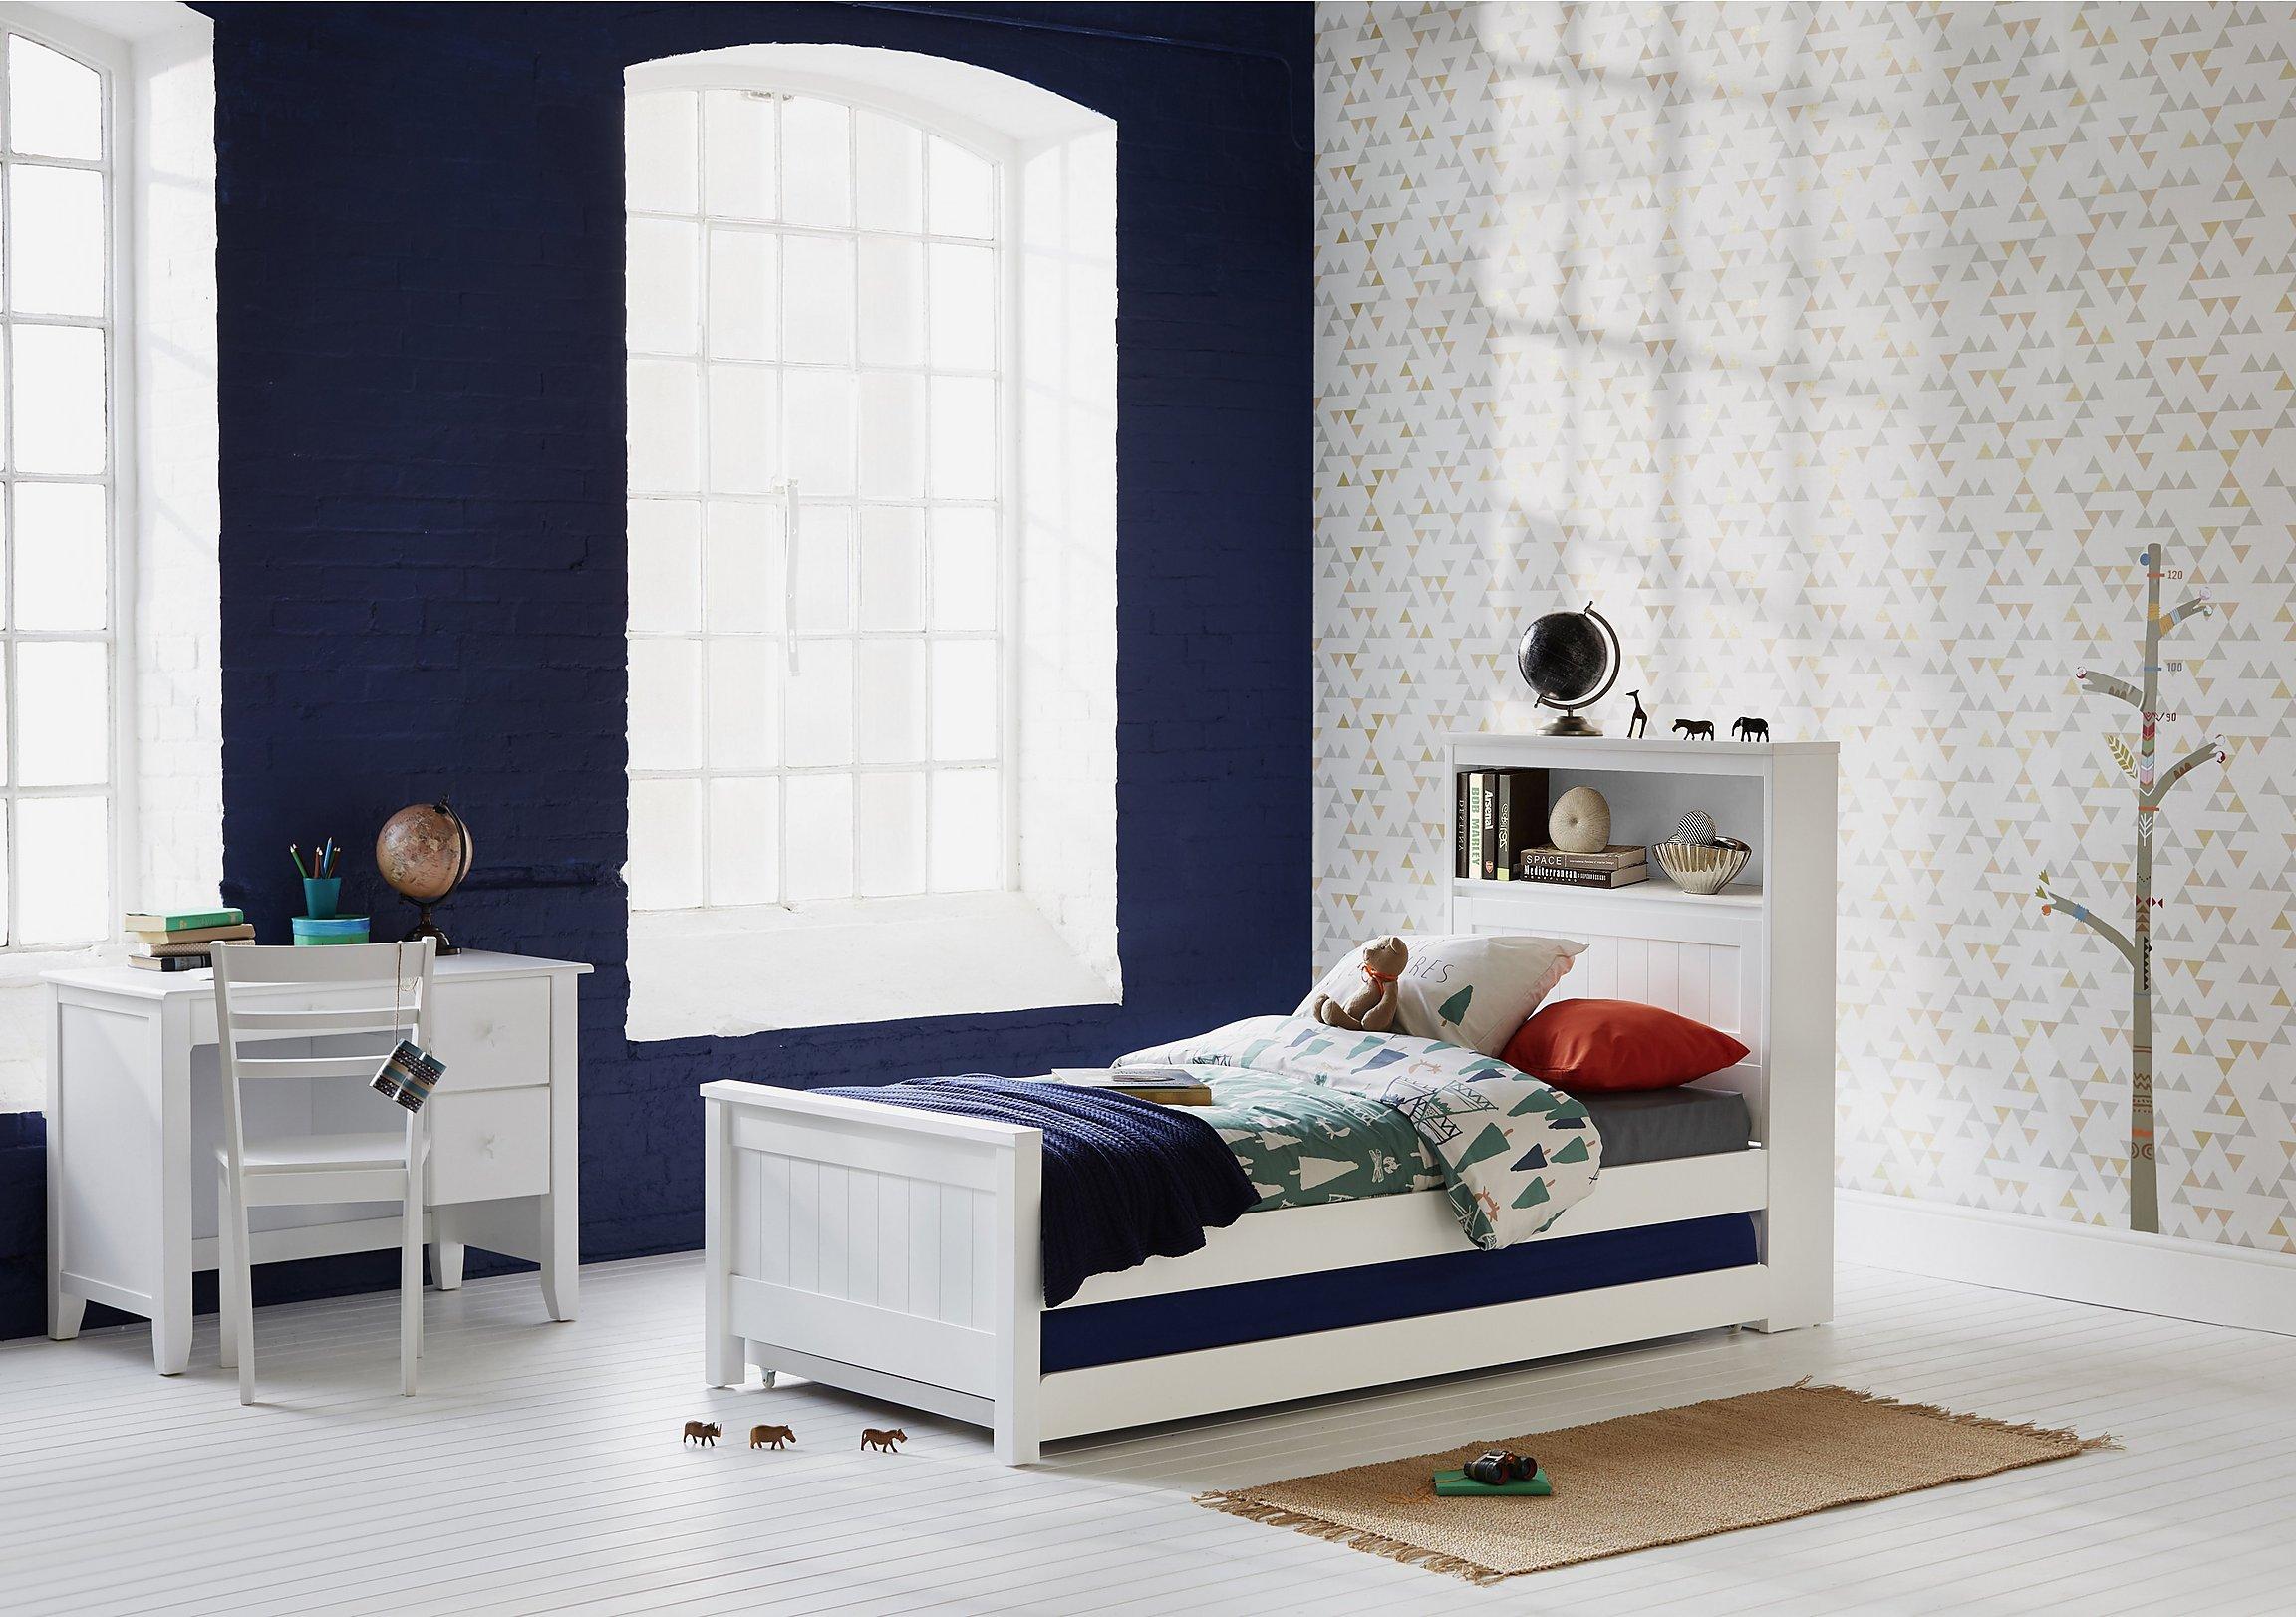 Single Bedroom Furniture Explorer Single Storage Bed The Childrens Furniture Company